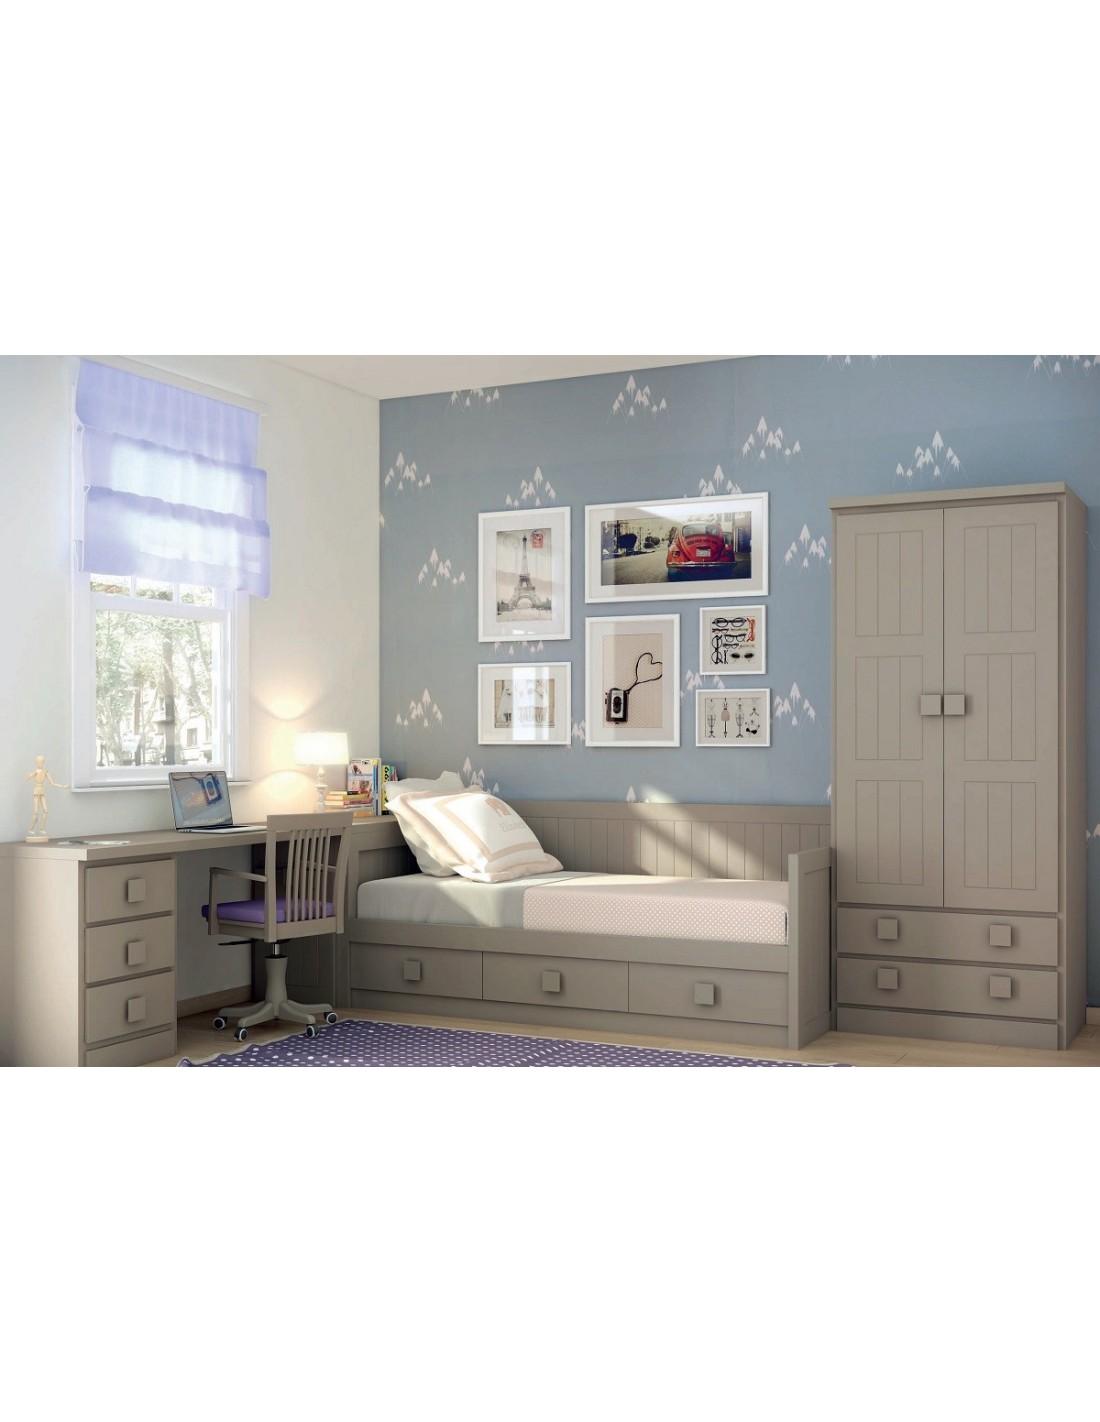 Dormitorios juveniles en madrid elegant dormitorios - Dormitorios juveniles de segunda mano en madrid ...